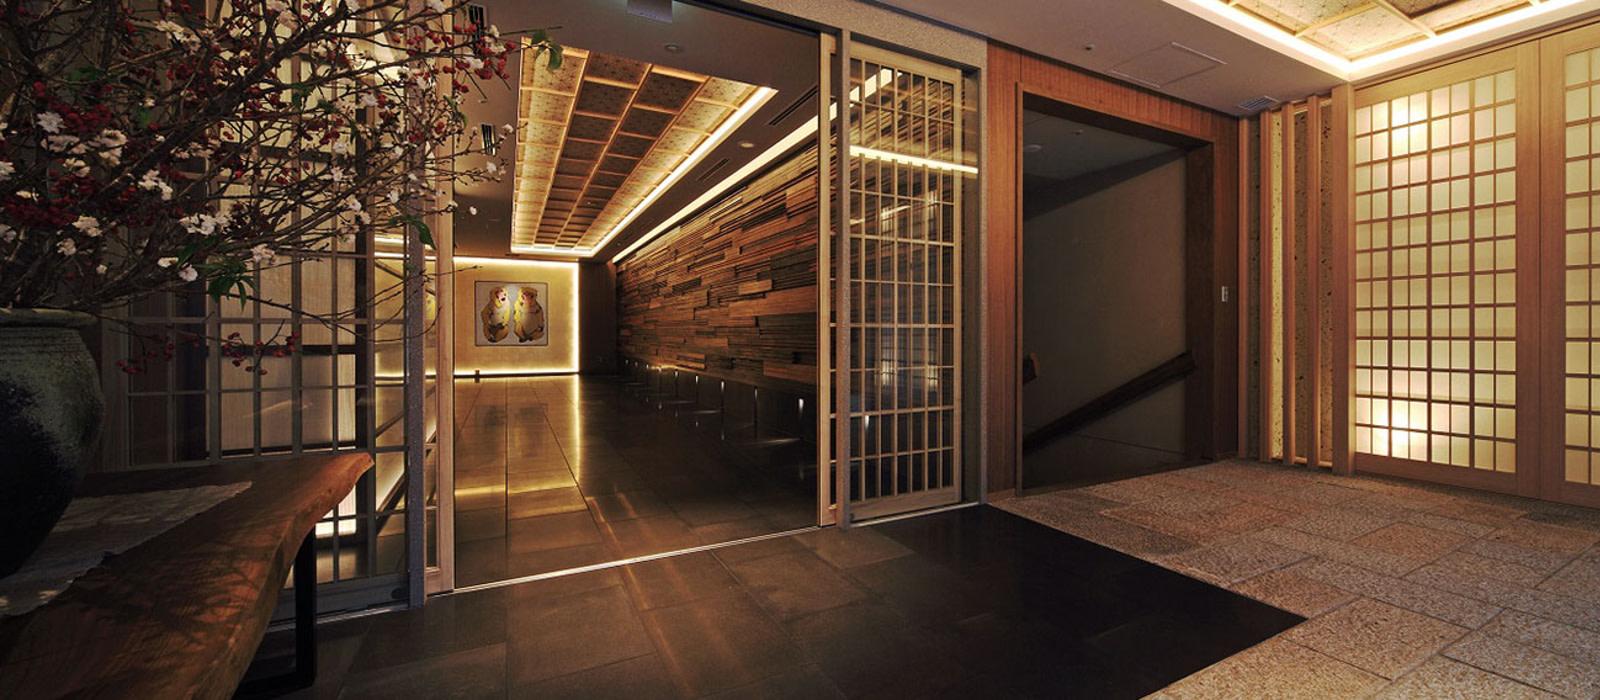 Hotel Noku Roxy Kyoto Japan